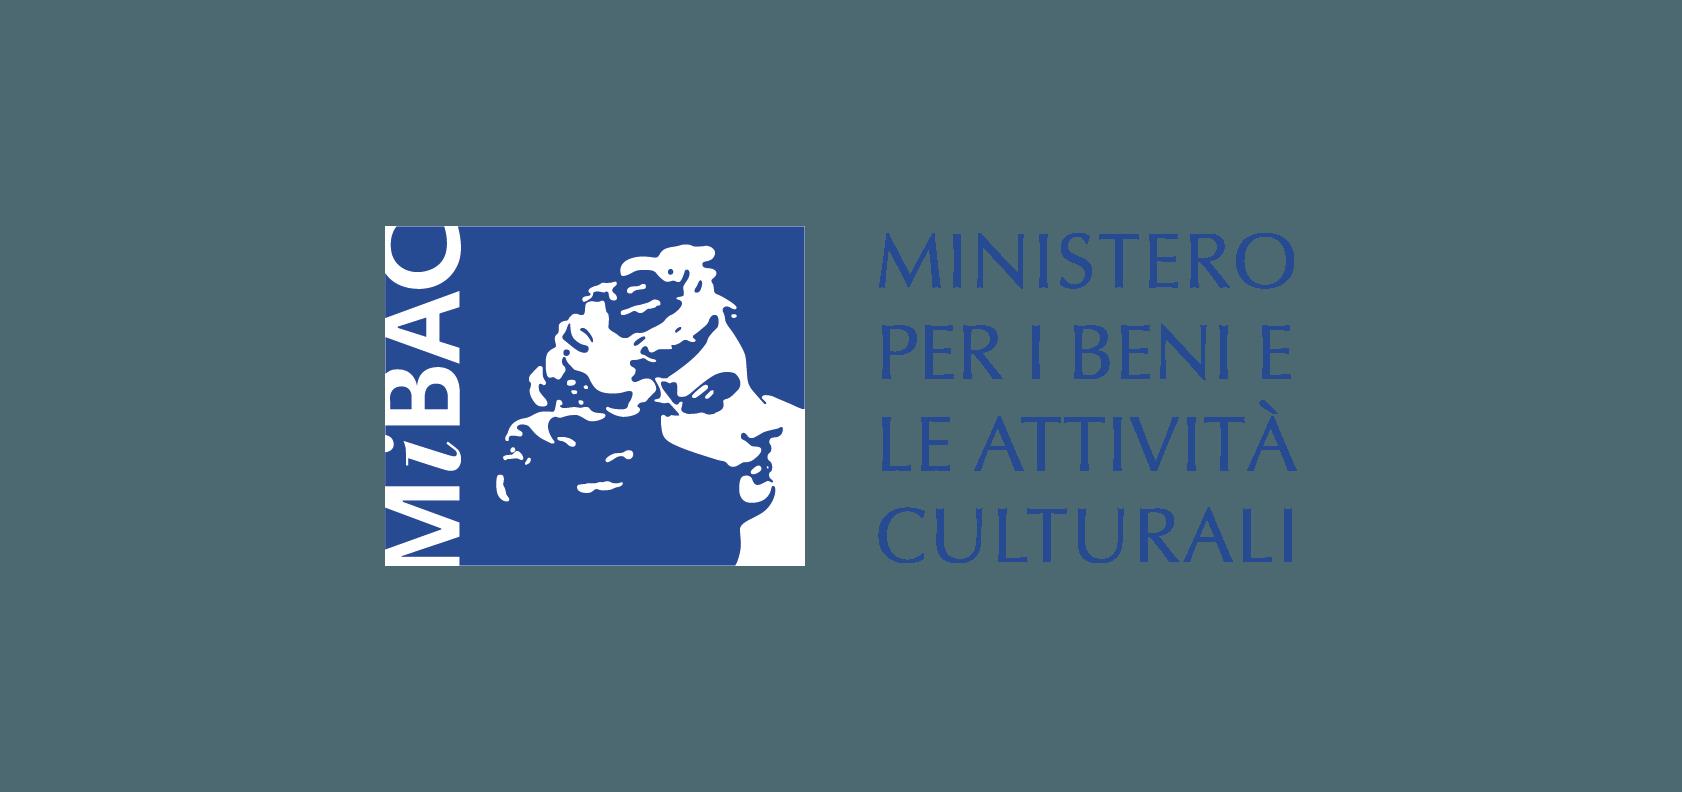 31 - ministero beni cult